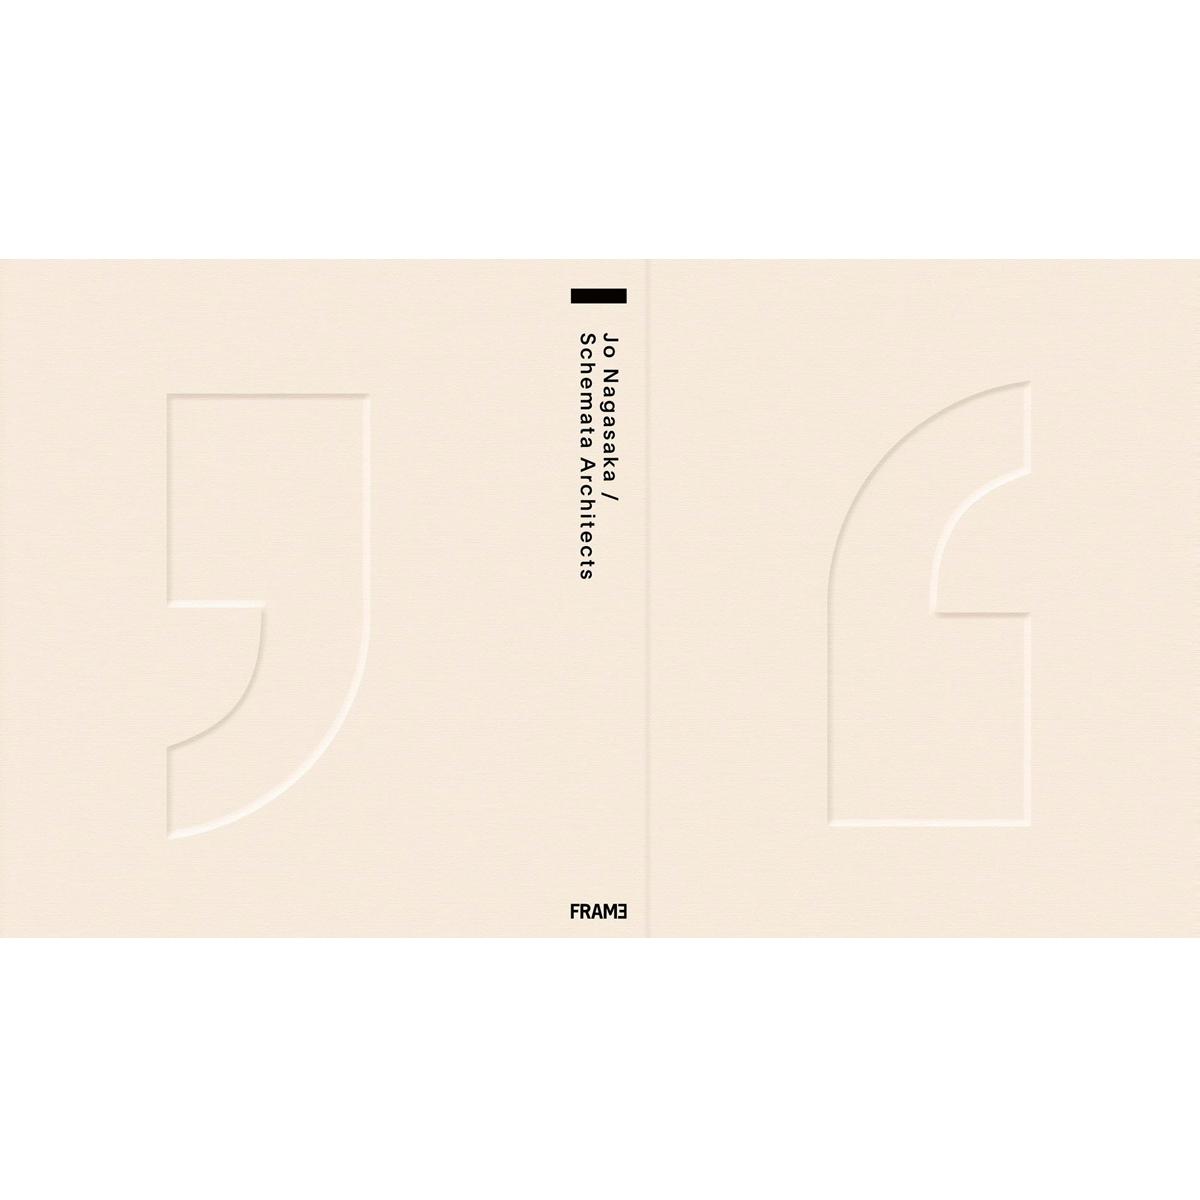 Jo Nagasaka / Schemata Architects